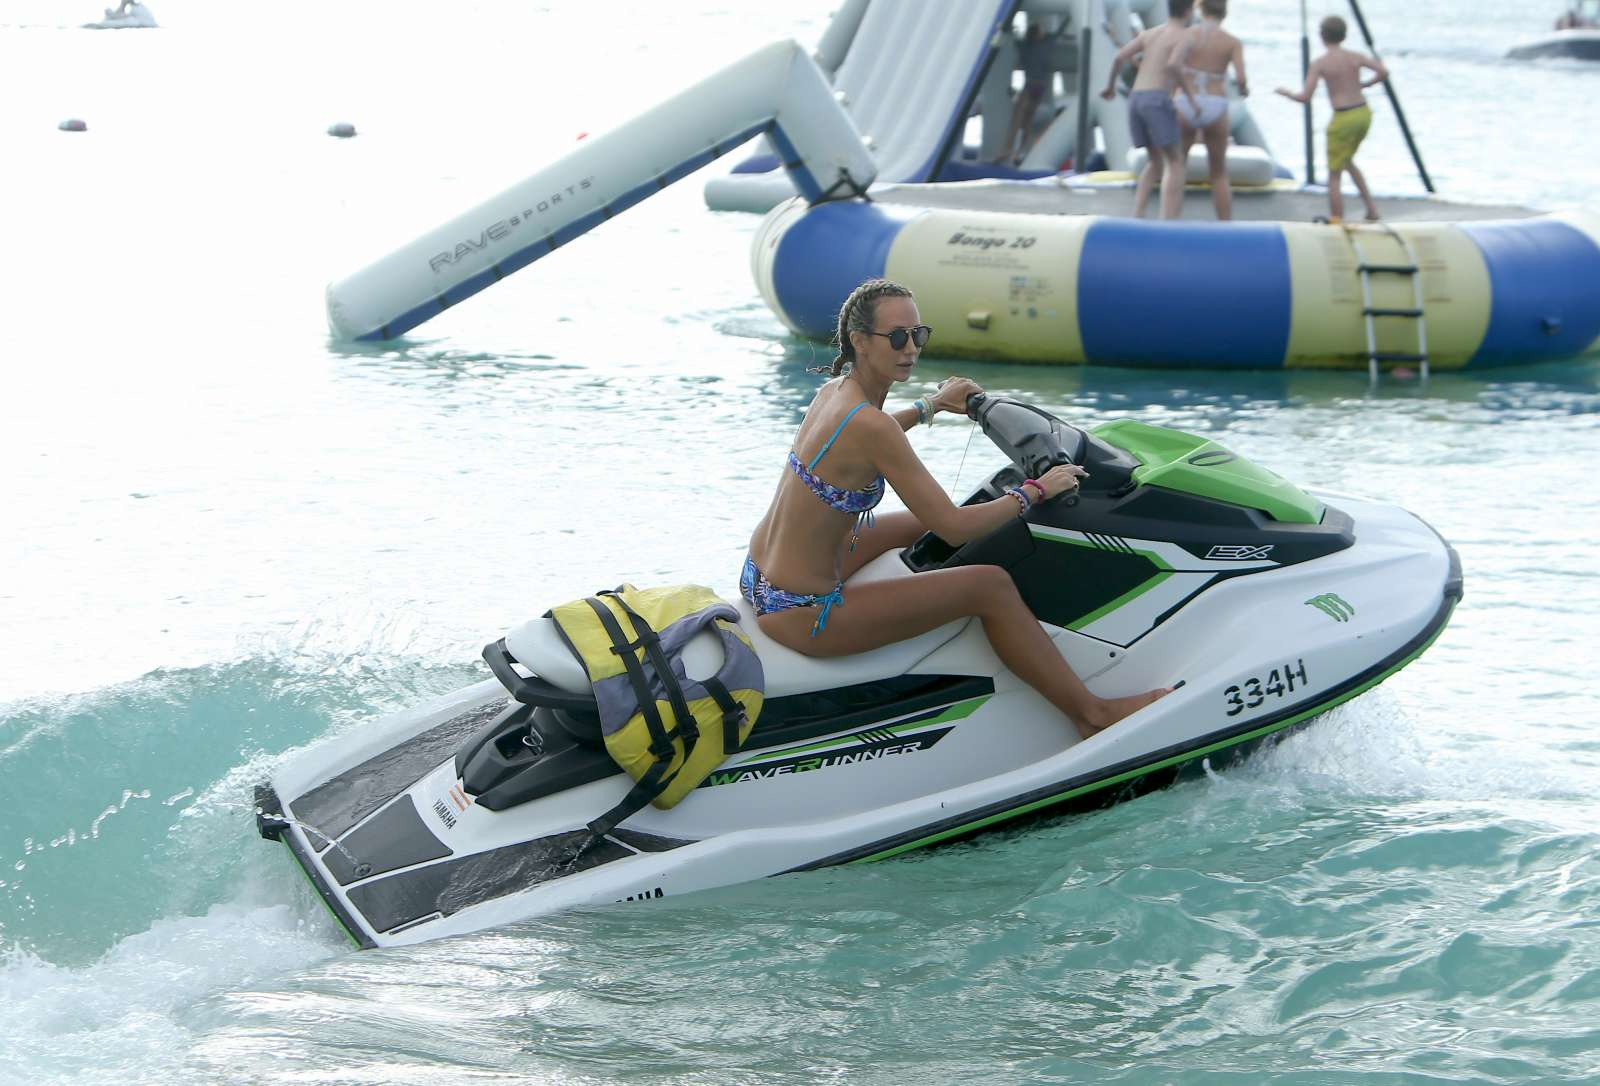 Lady Victoria Hervey 2017 : Lady Victoria Hervey in Bikini 2017 -49